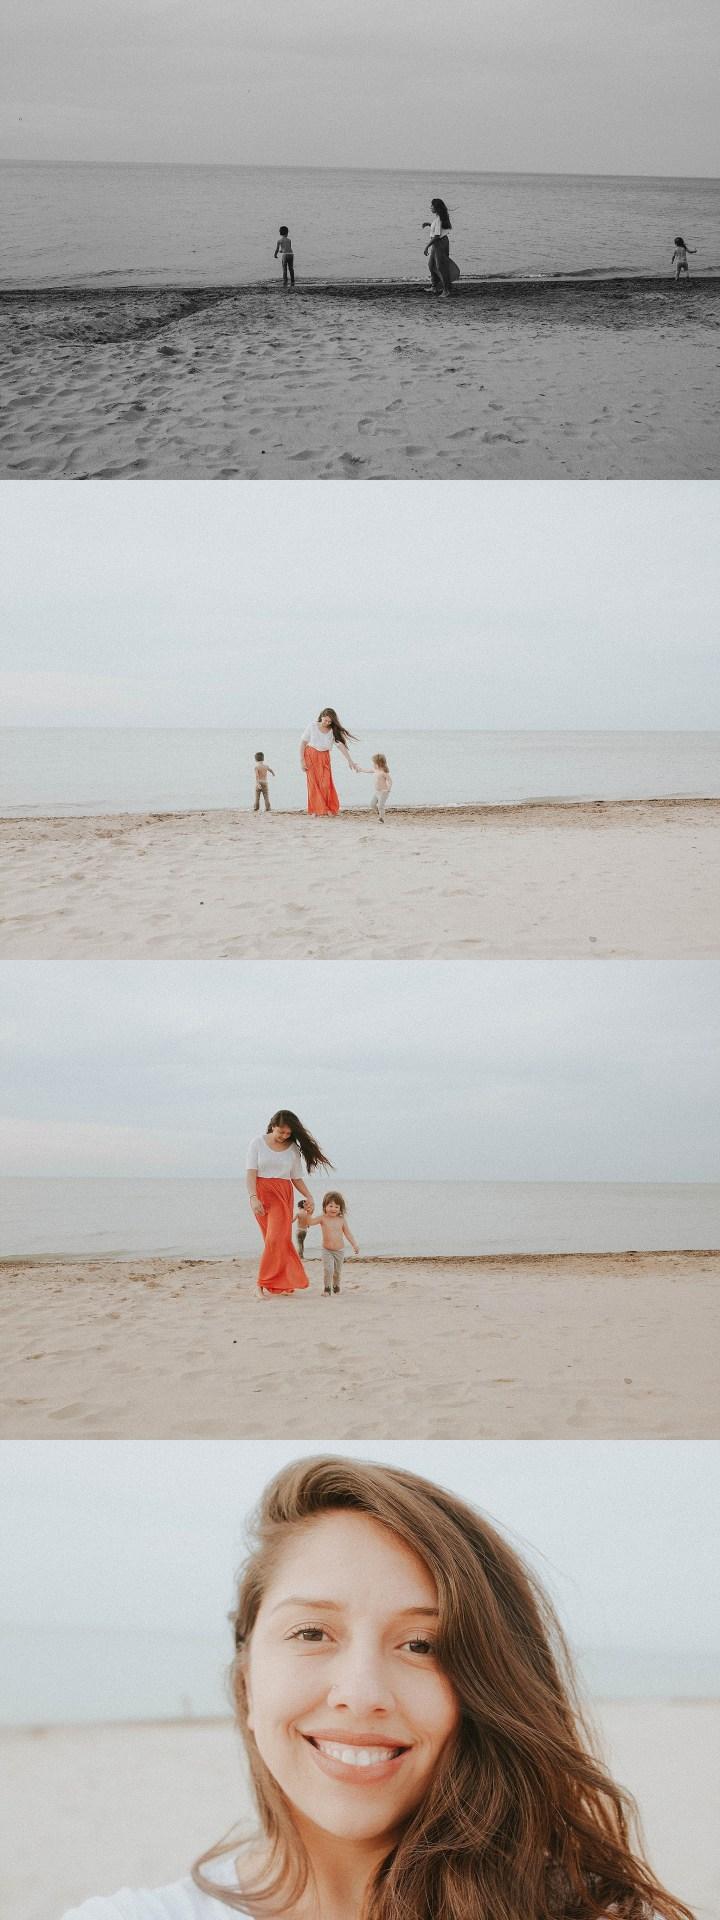 Chicago and west suburbs family photography Adri de la cruz photographer (11)